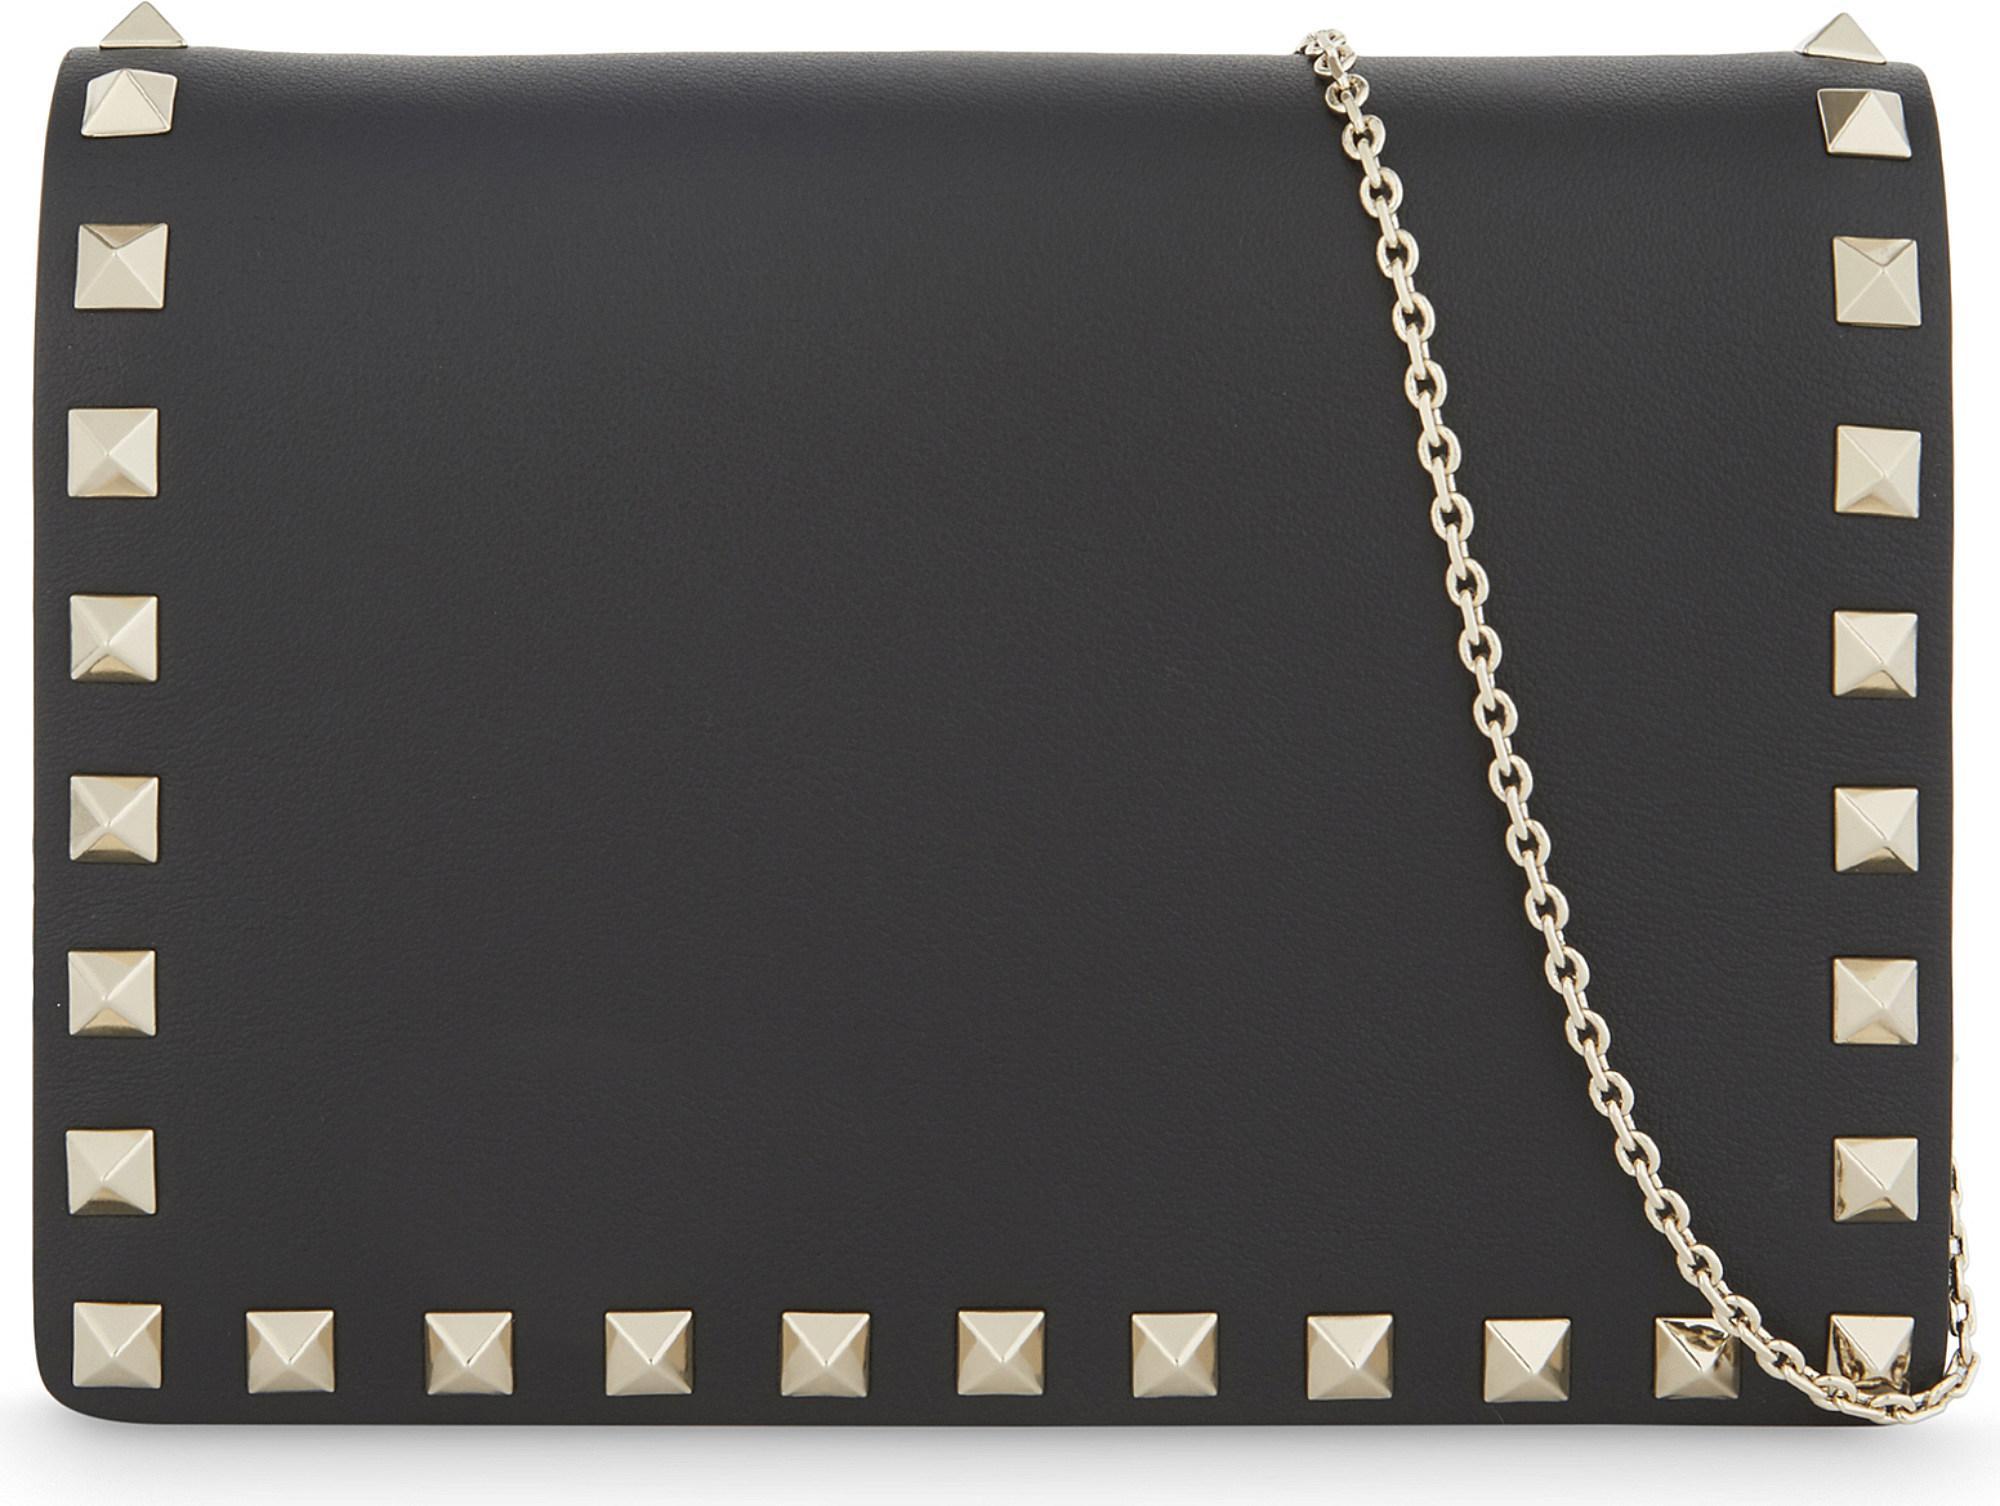 19f505c25584c Lyst - Valentino Rockstud Small Leather Cross-body Bag in Black